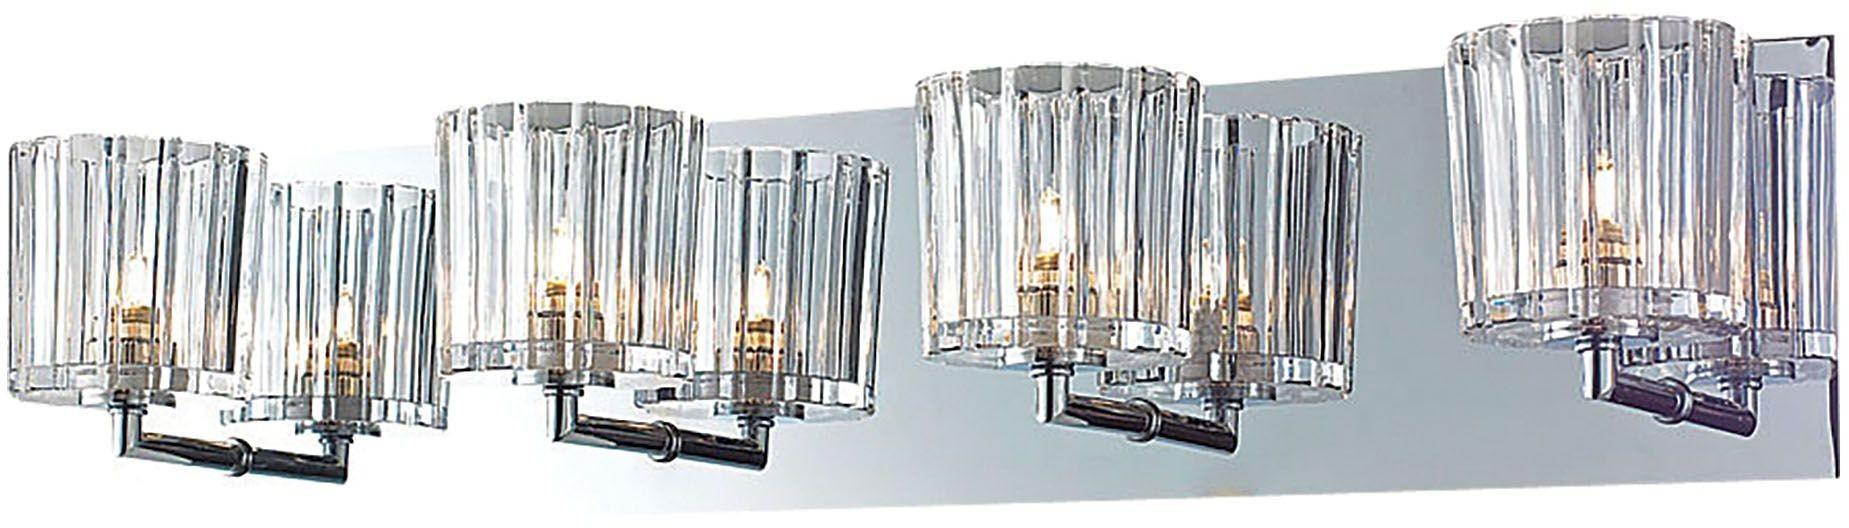 Cut Glass Vanity Light : Sprocket Chrome And Clear Sprocket Cut Glass 4 Light Vanity, BV4004-0-15, Alico